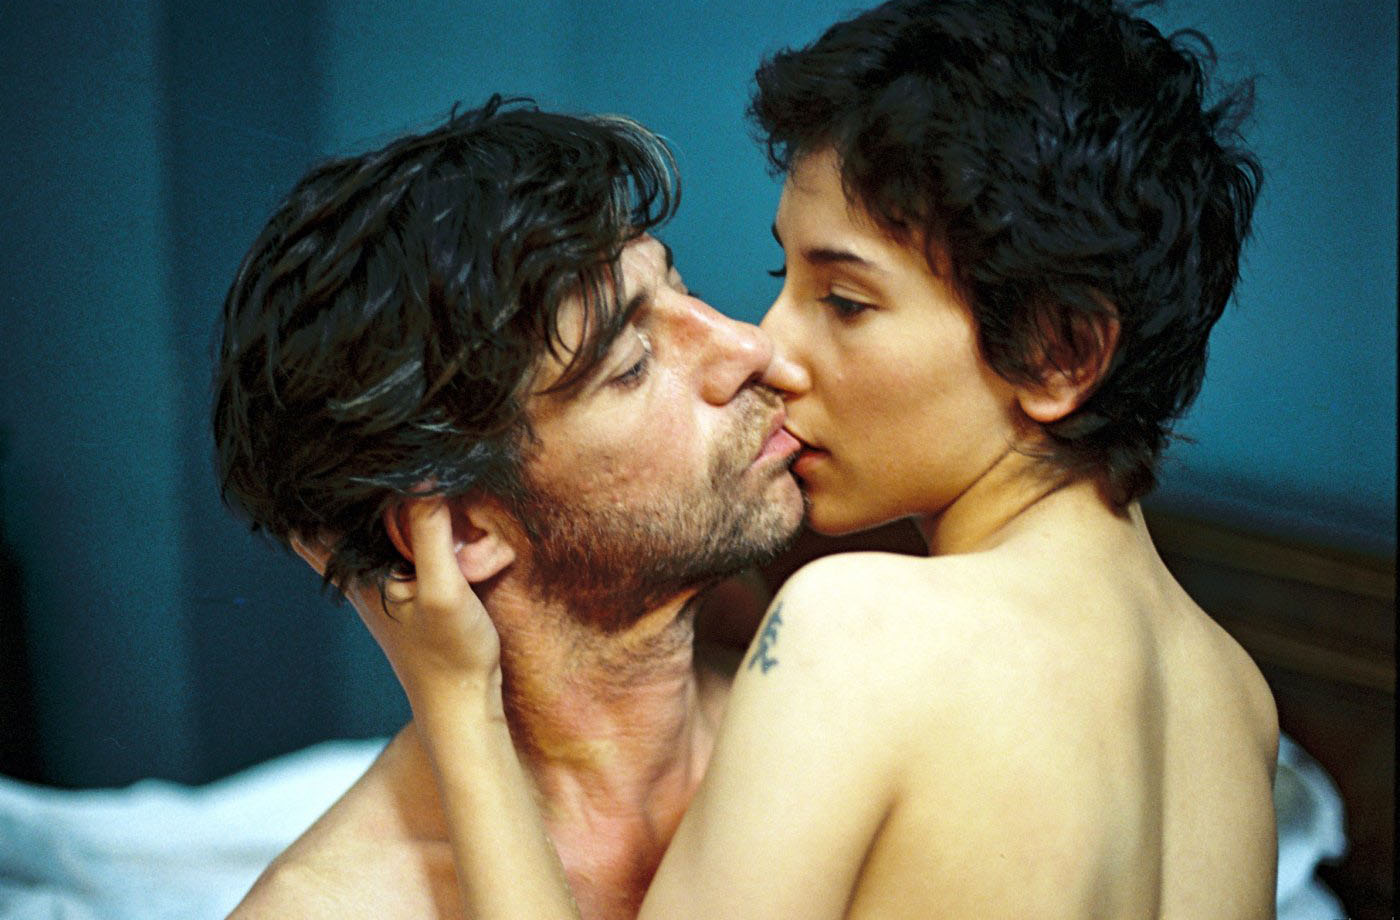 Секс в кино сибель кекиле 62